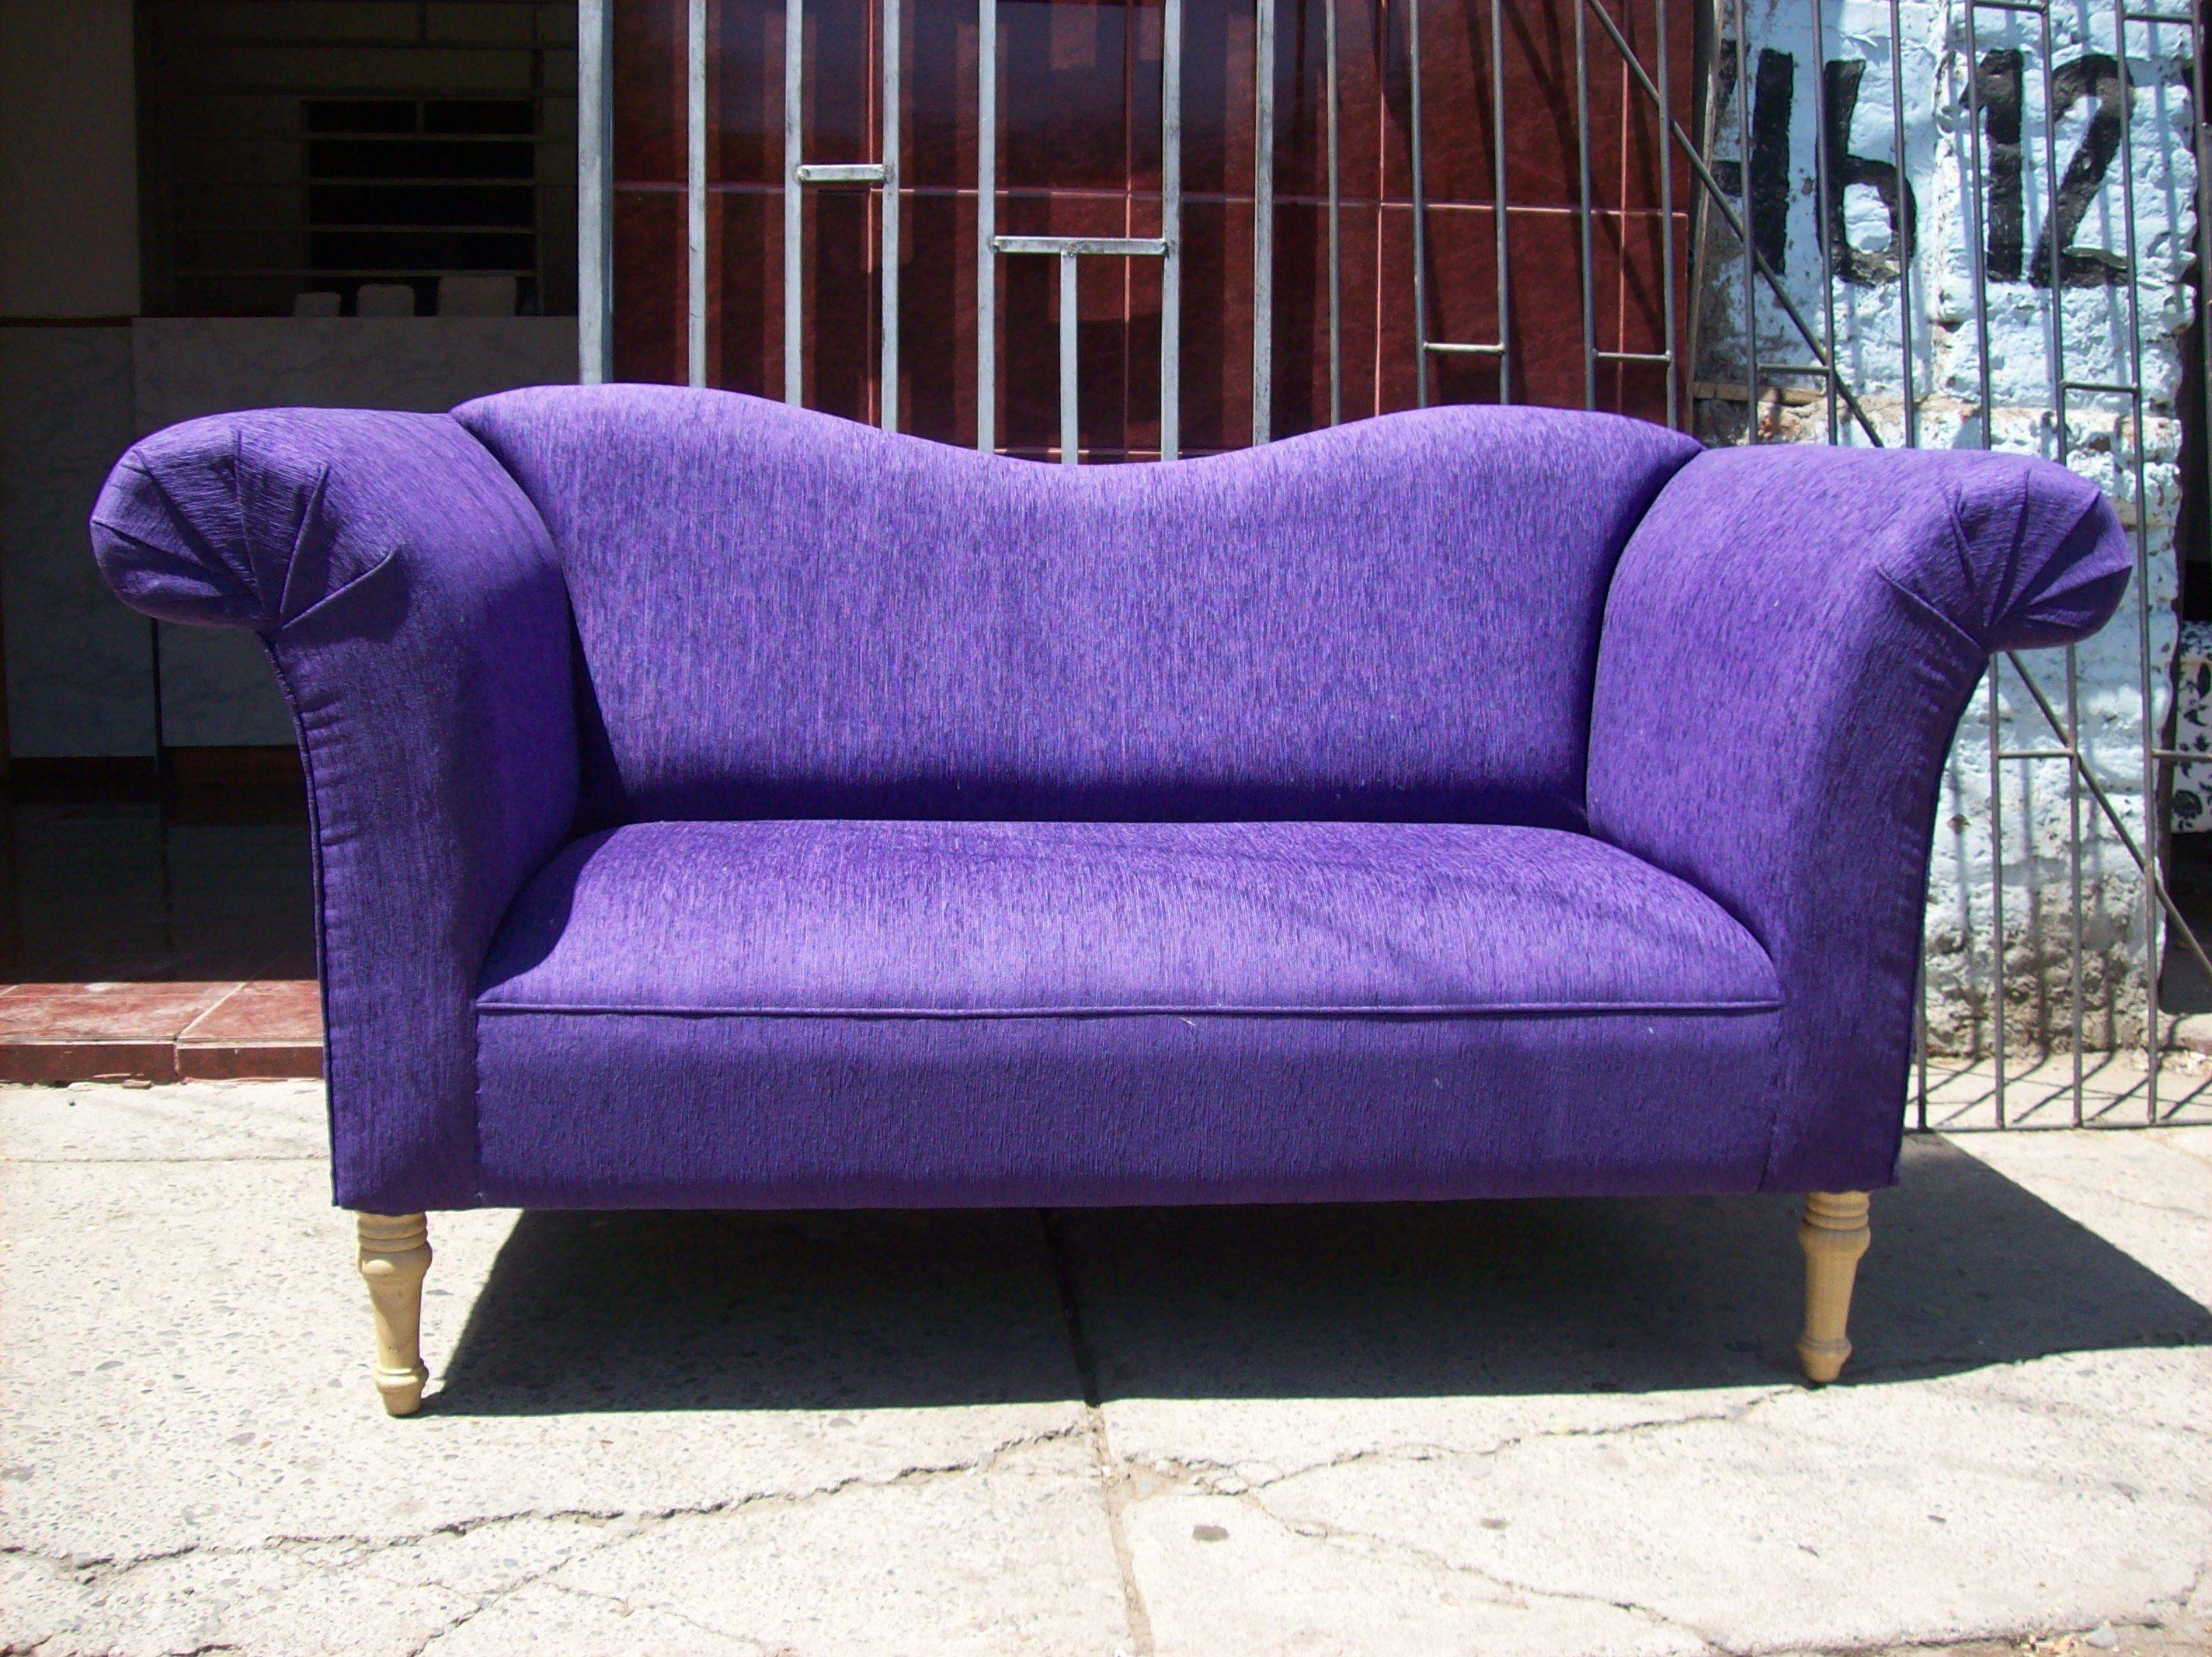 sofa italy...... decoravintage claro¡¡¡¡